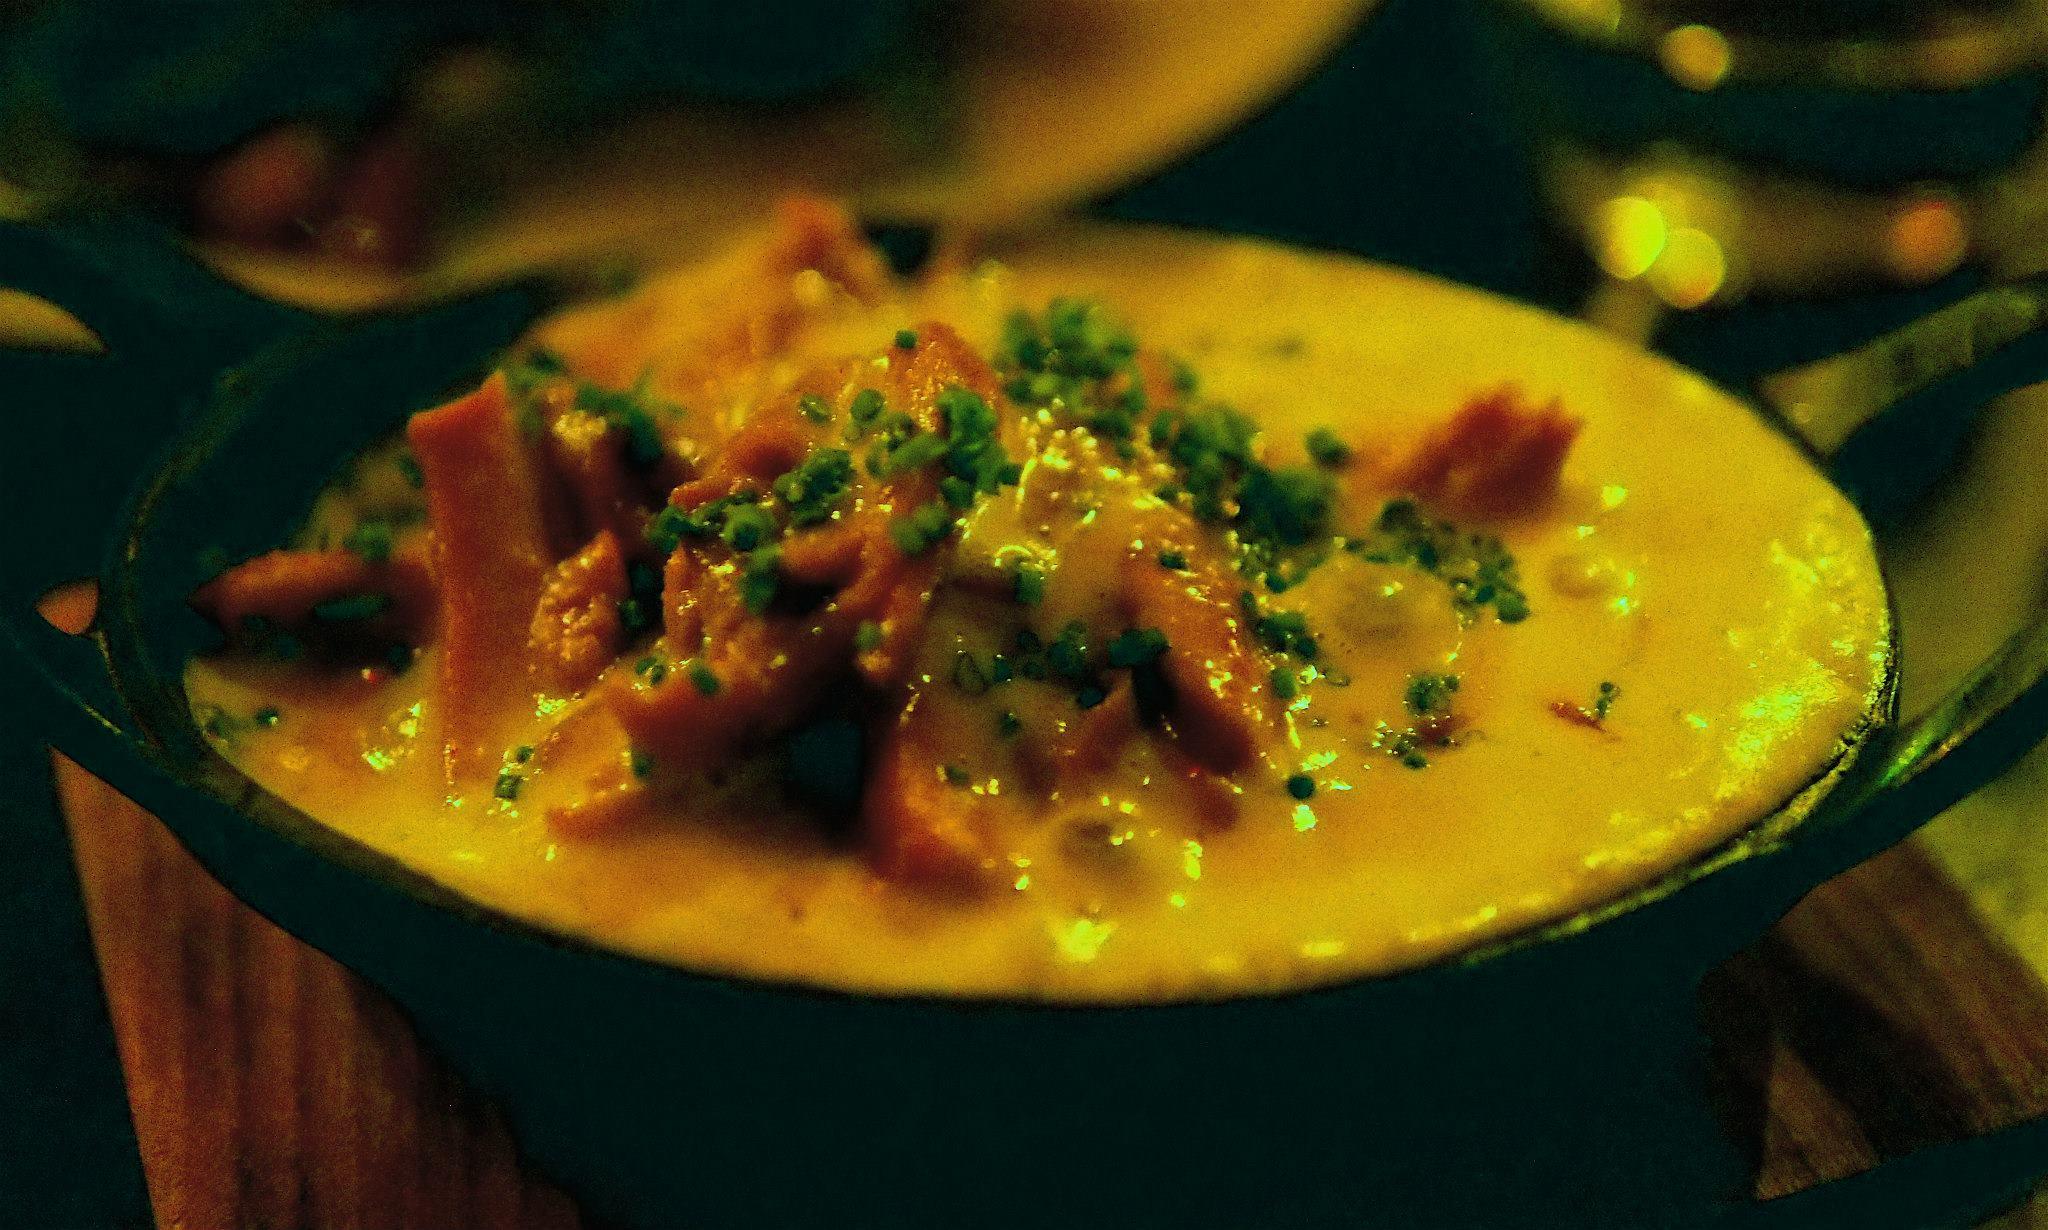 Dark meat chunks with amazing, flavorful gravy